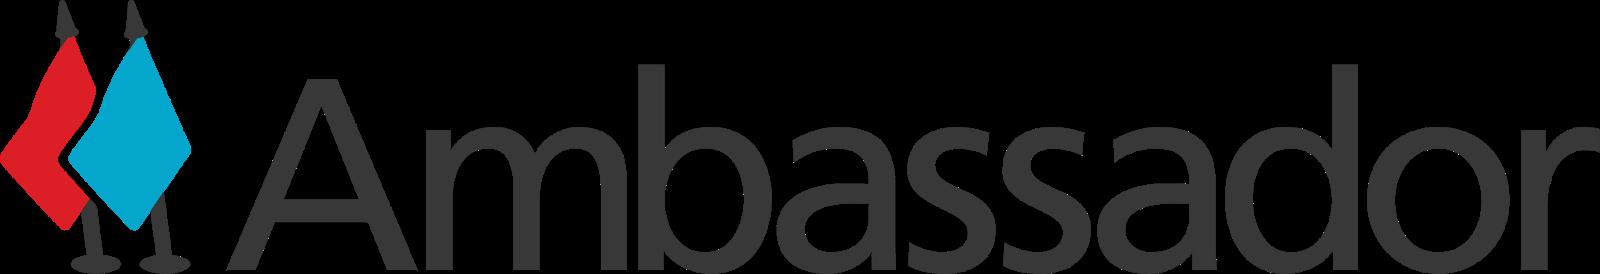 Ambassador Referral Marketing Software